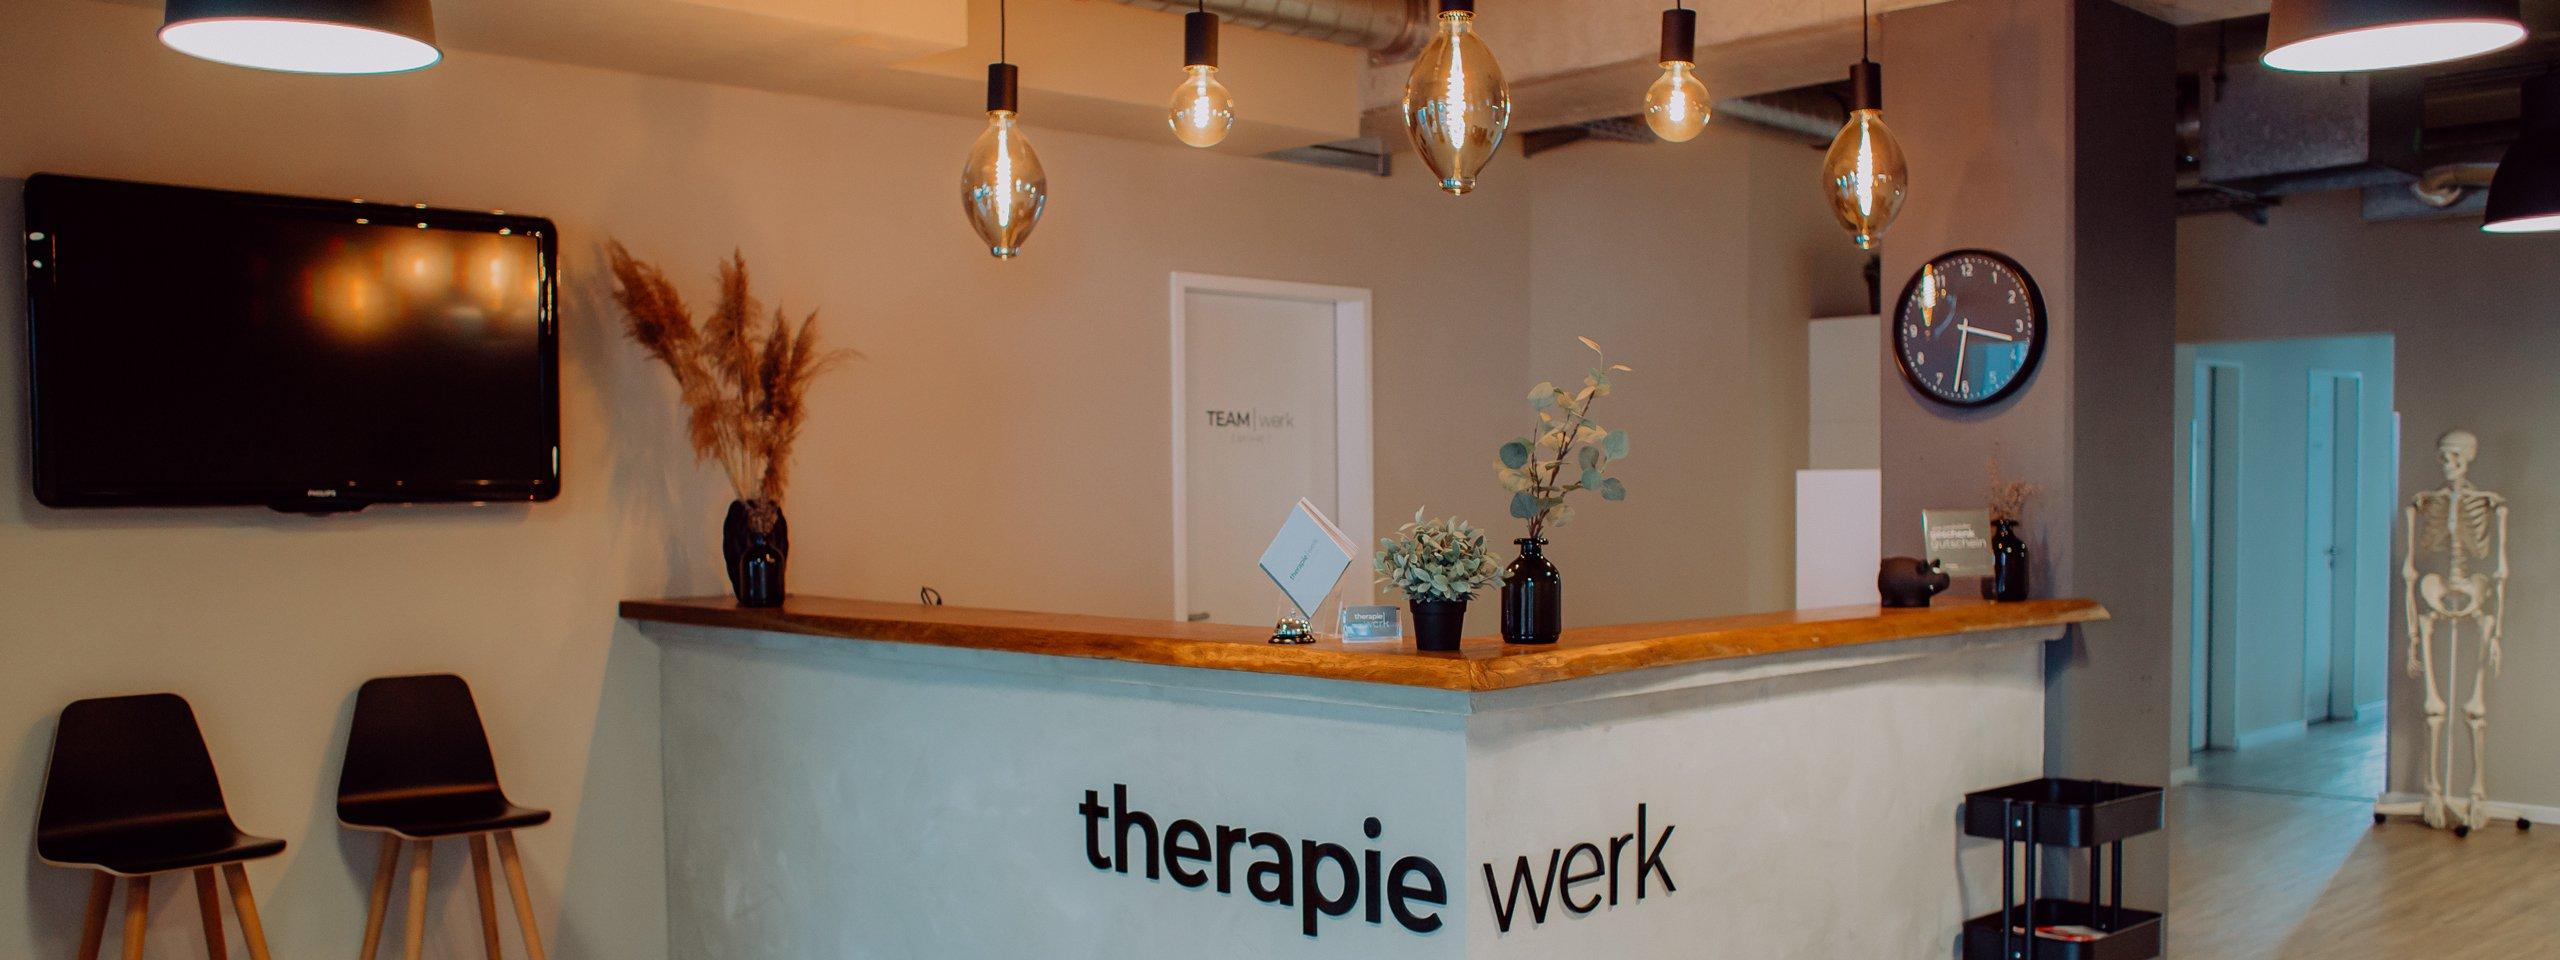 physiopraxis_therapiewerk-bayreuth